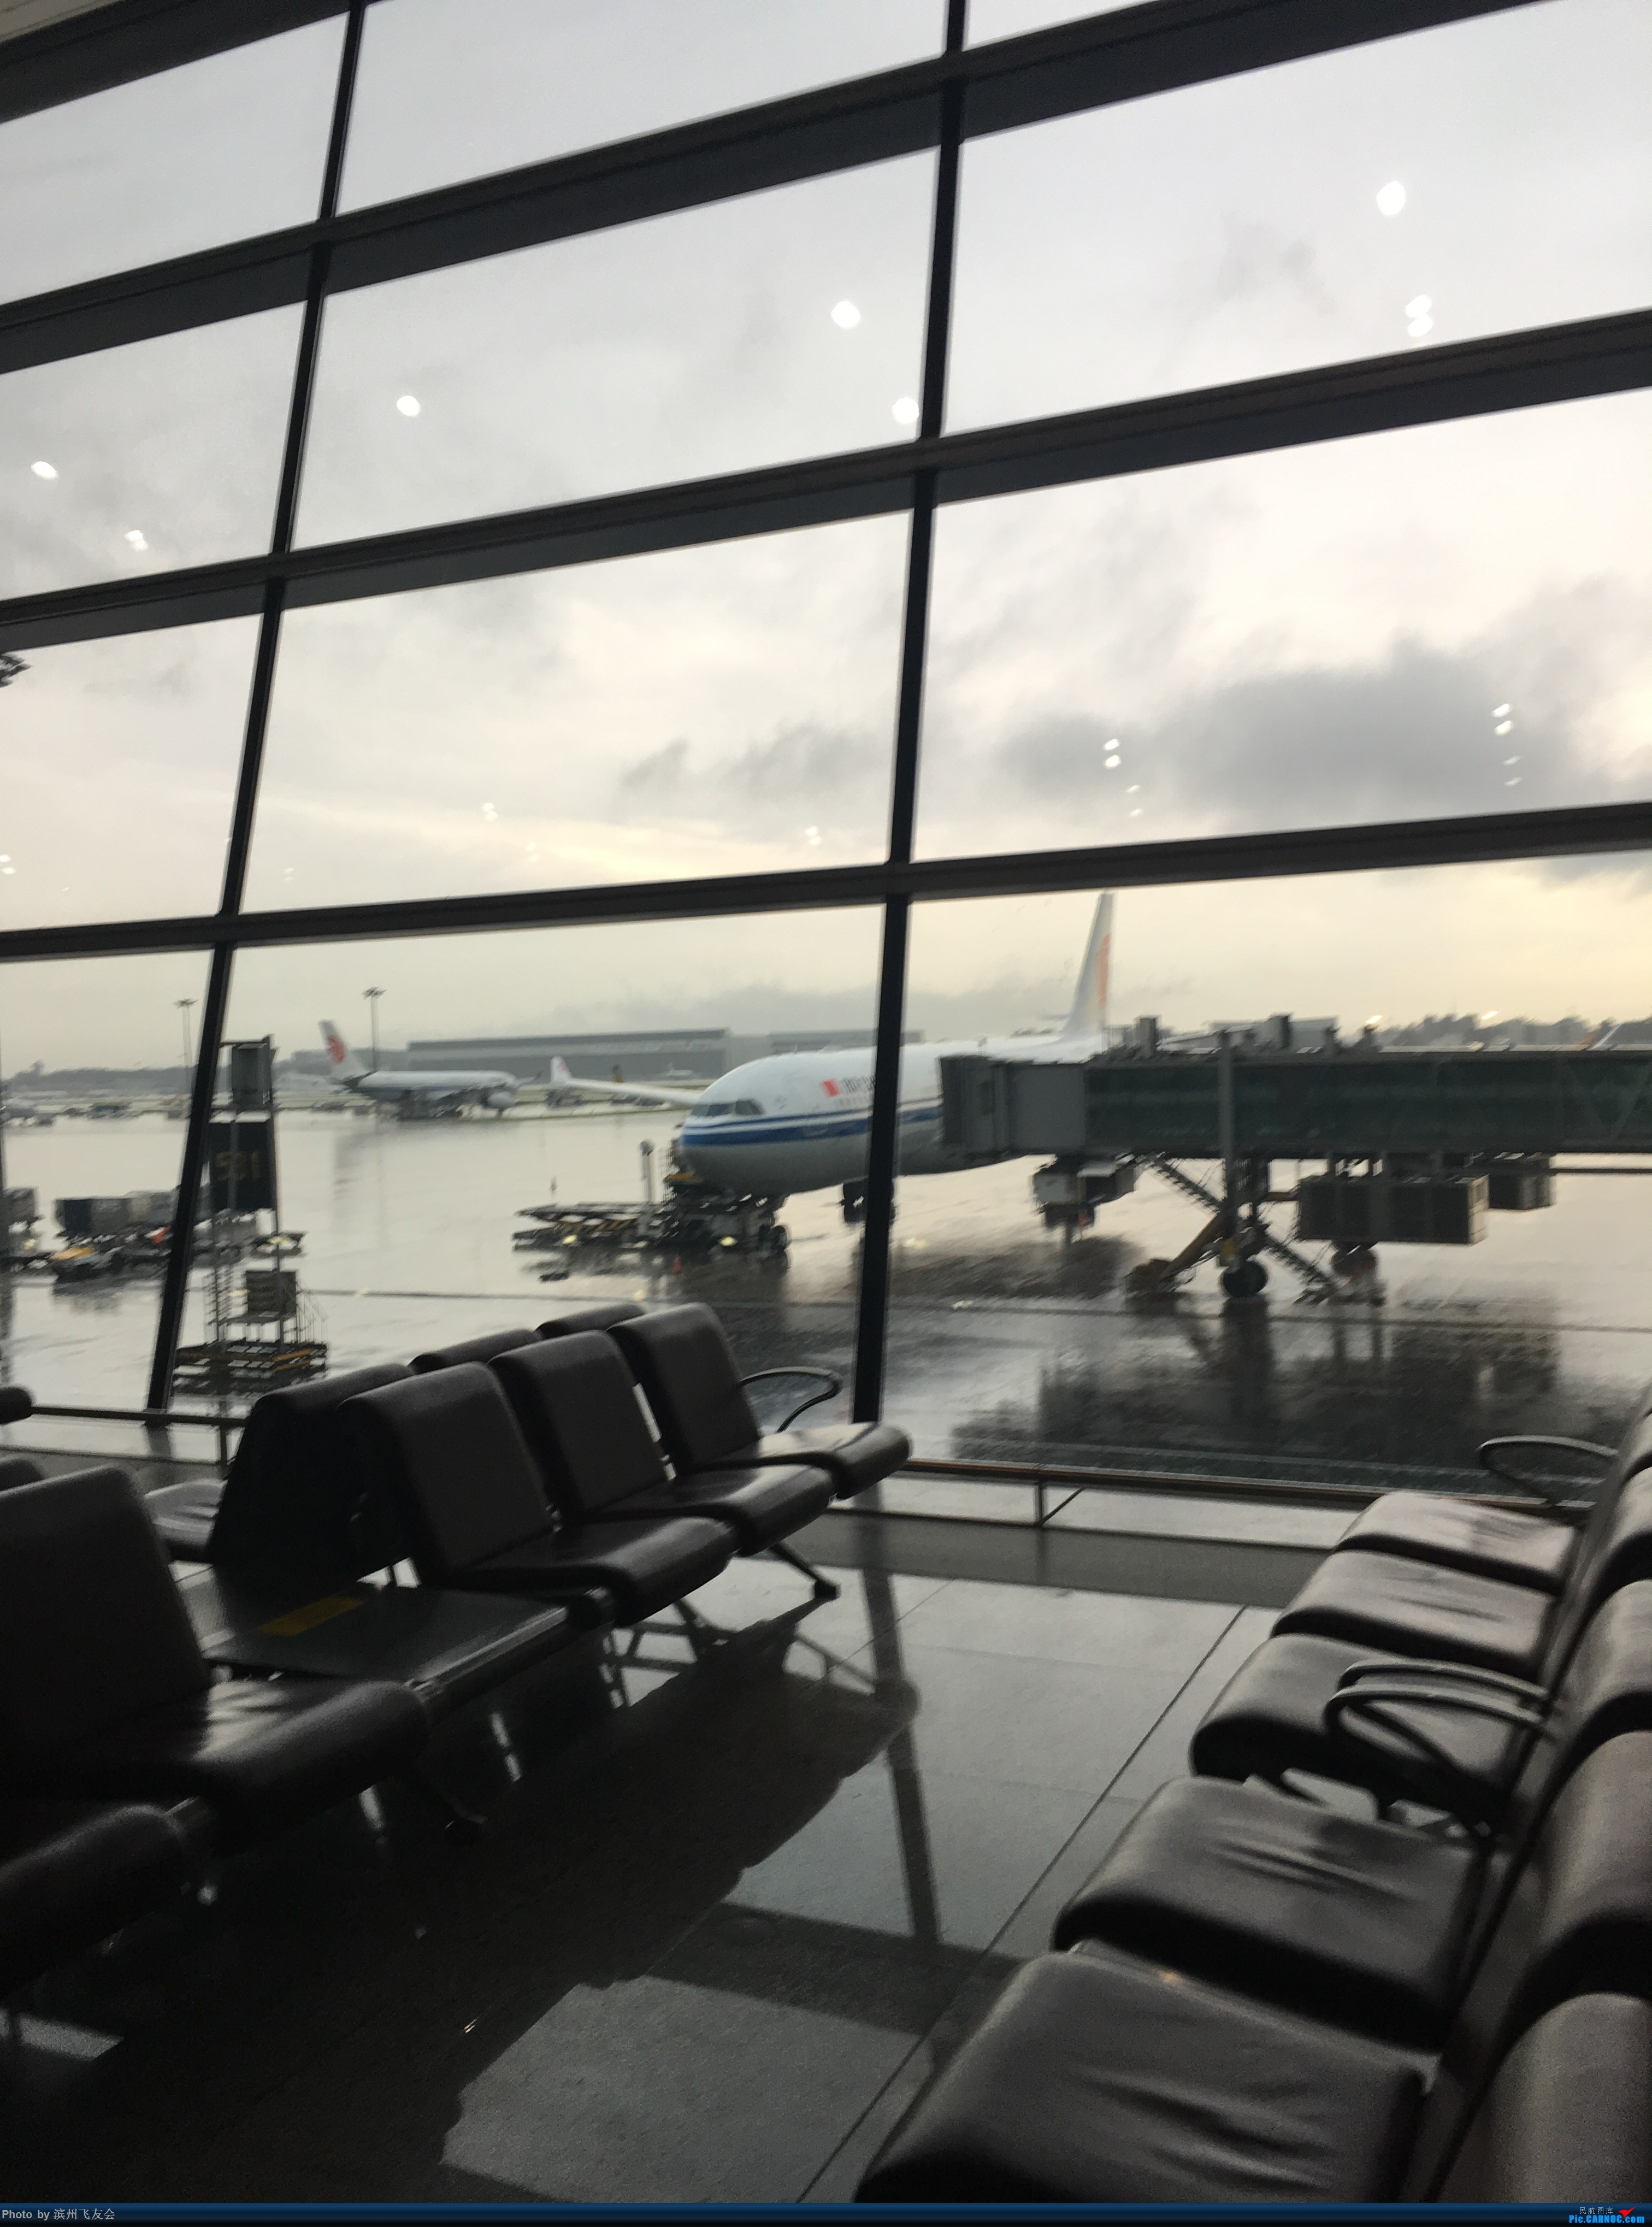 Re:[原创]~骚年飞行篇~补充半年前的香港之路,国航CA111 PEK-HKG,有幸坐到大擦第50架77W BOEING 777-300ER B-2033 中国北京首都国际机场 中国北京首都国际机场